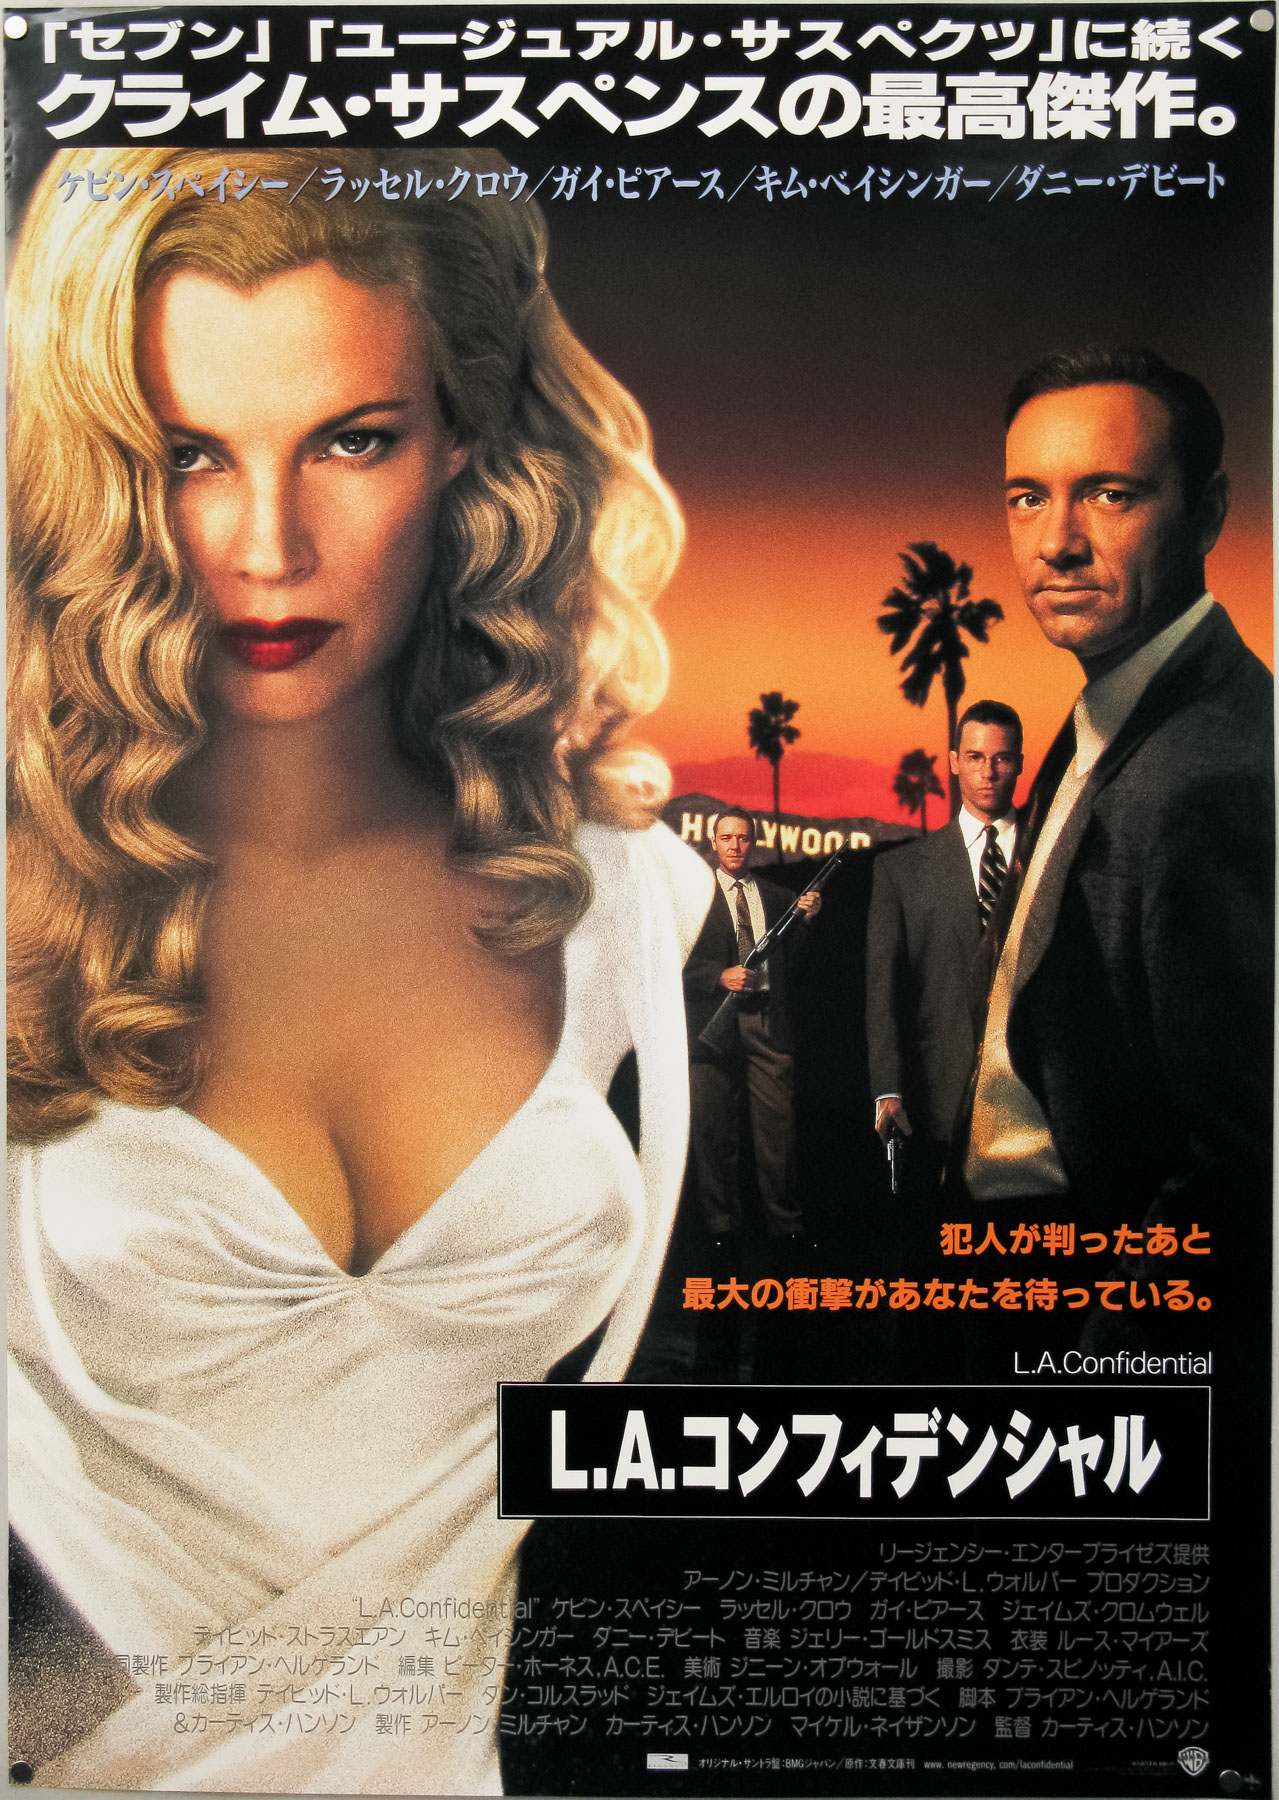 1997 LA Confidential Original Japanese poster of the premiere.